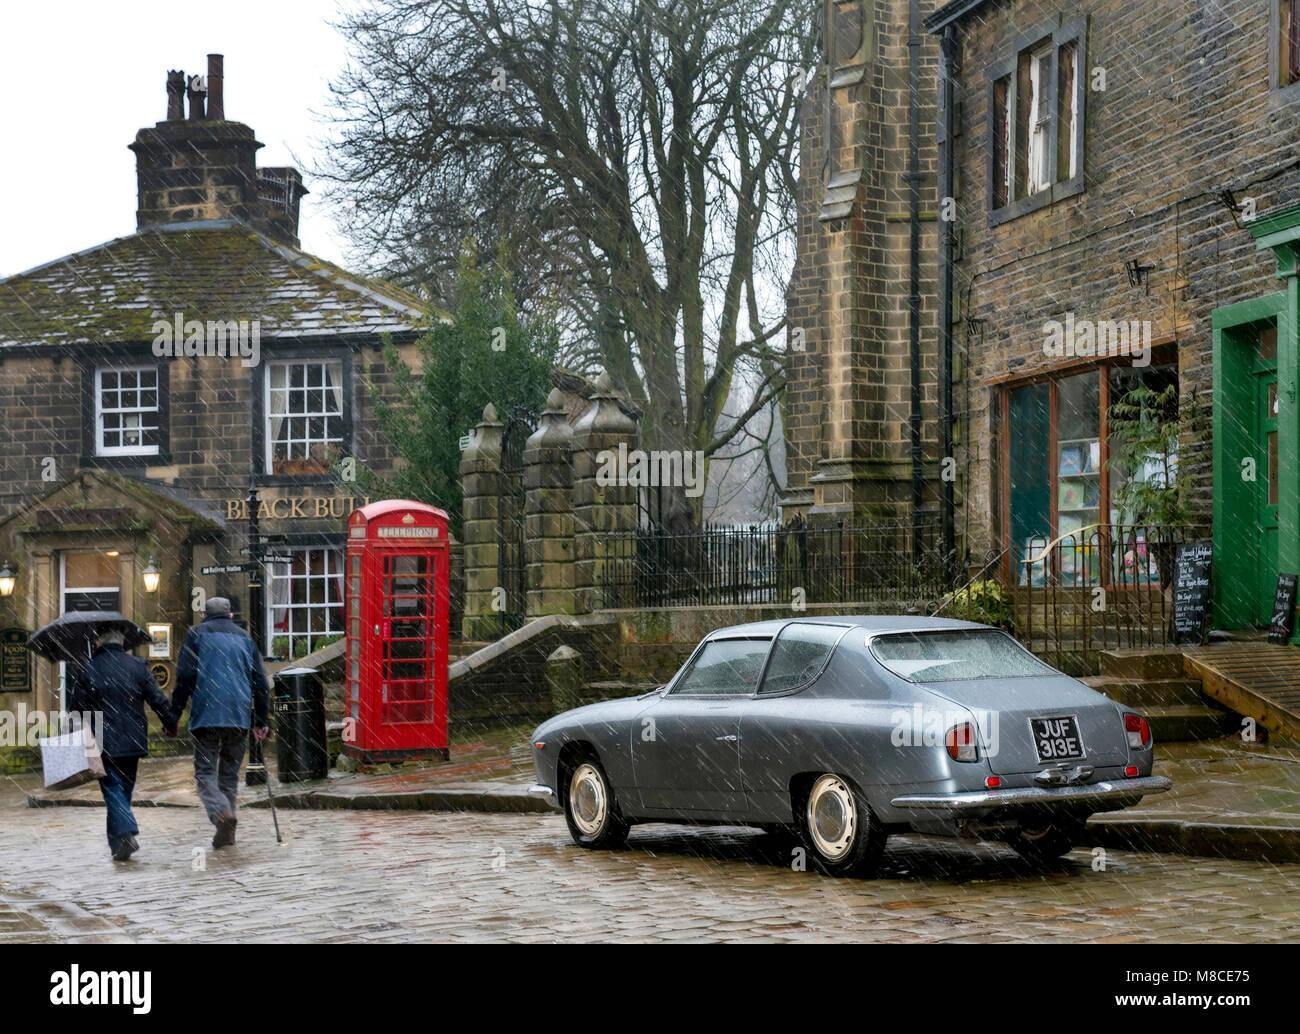 https://c8.alamy.com/comp/M8CE75/1967-lancia-flavia-zagato-in-main-street-haworth-west-yorkshire-M8CE75.jpg